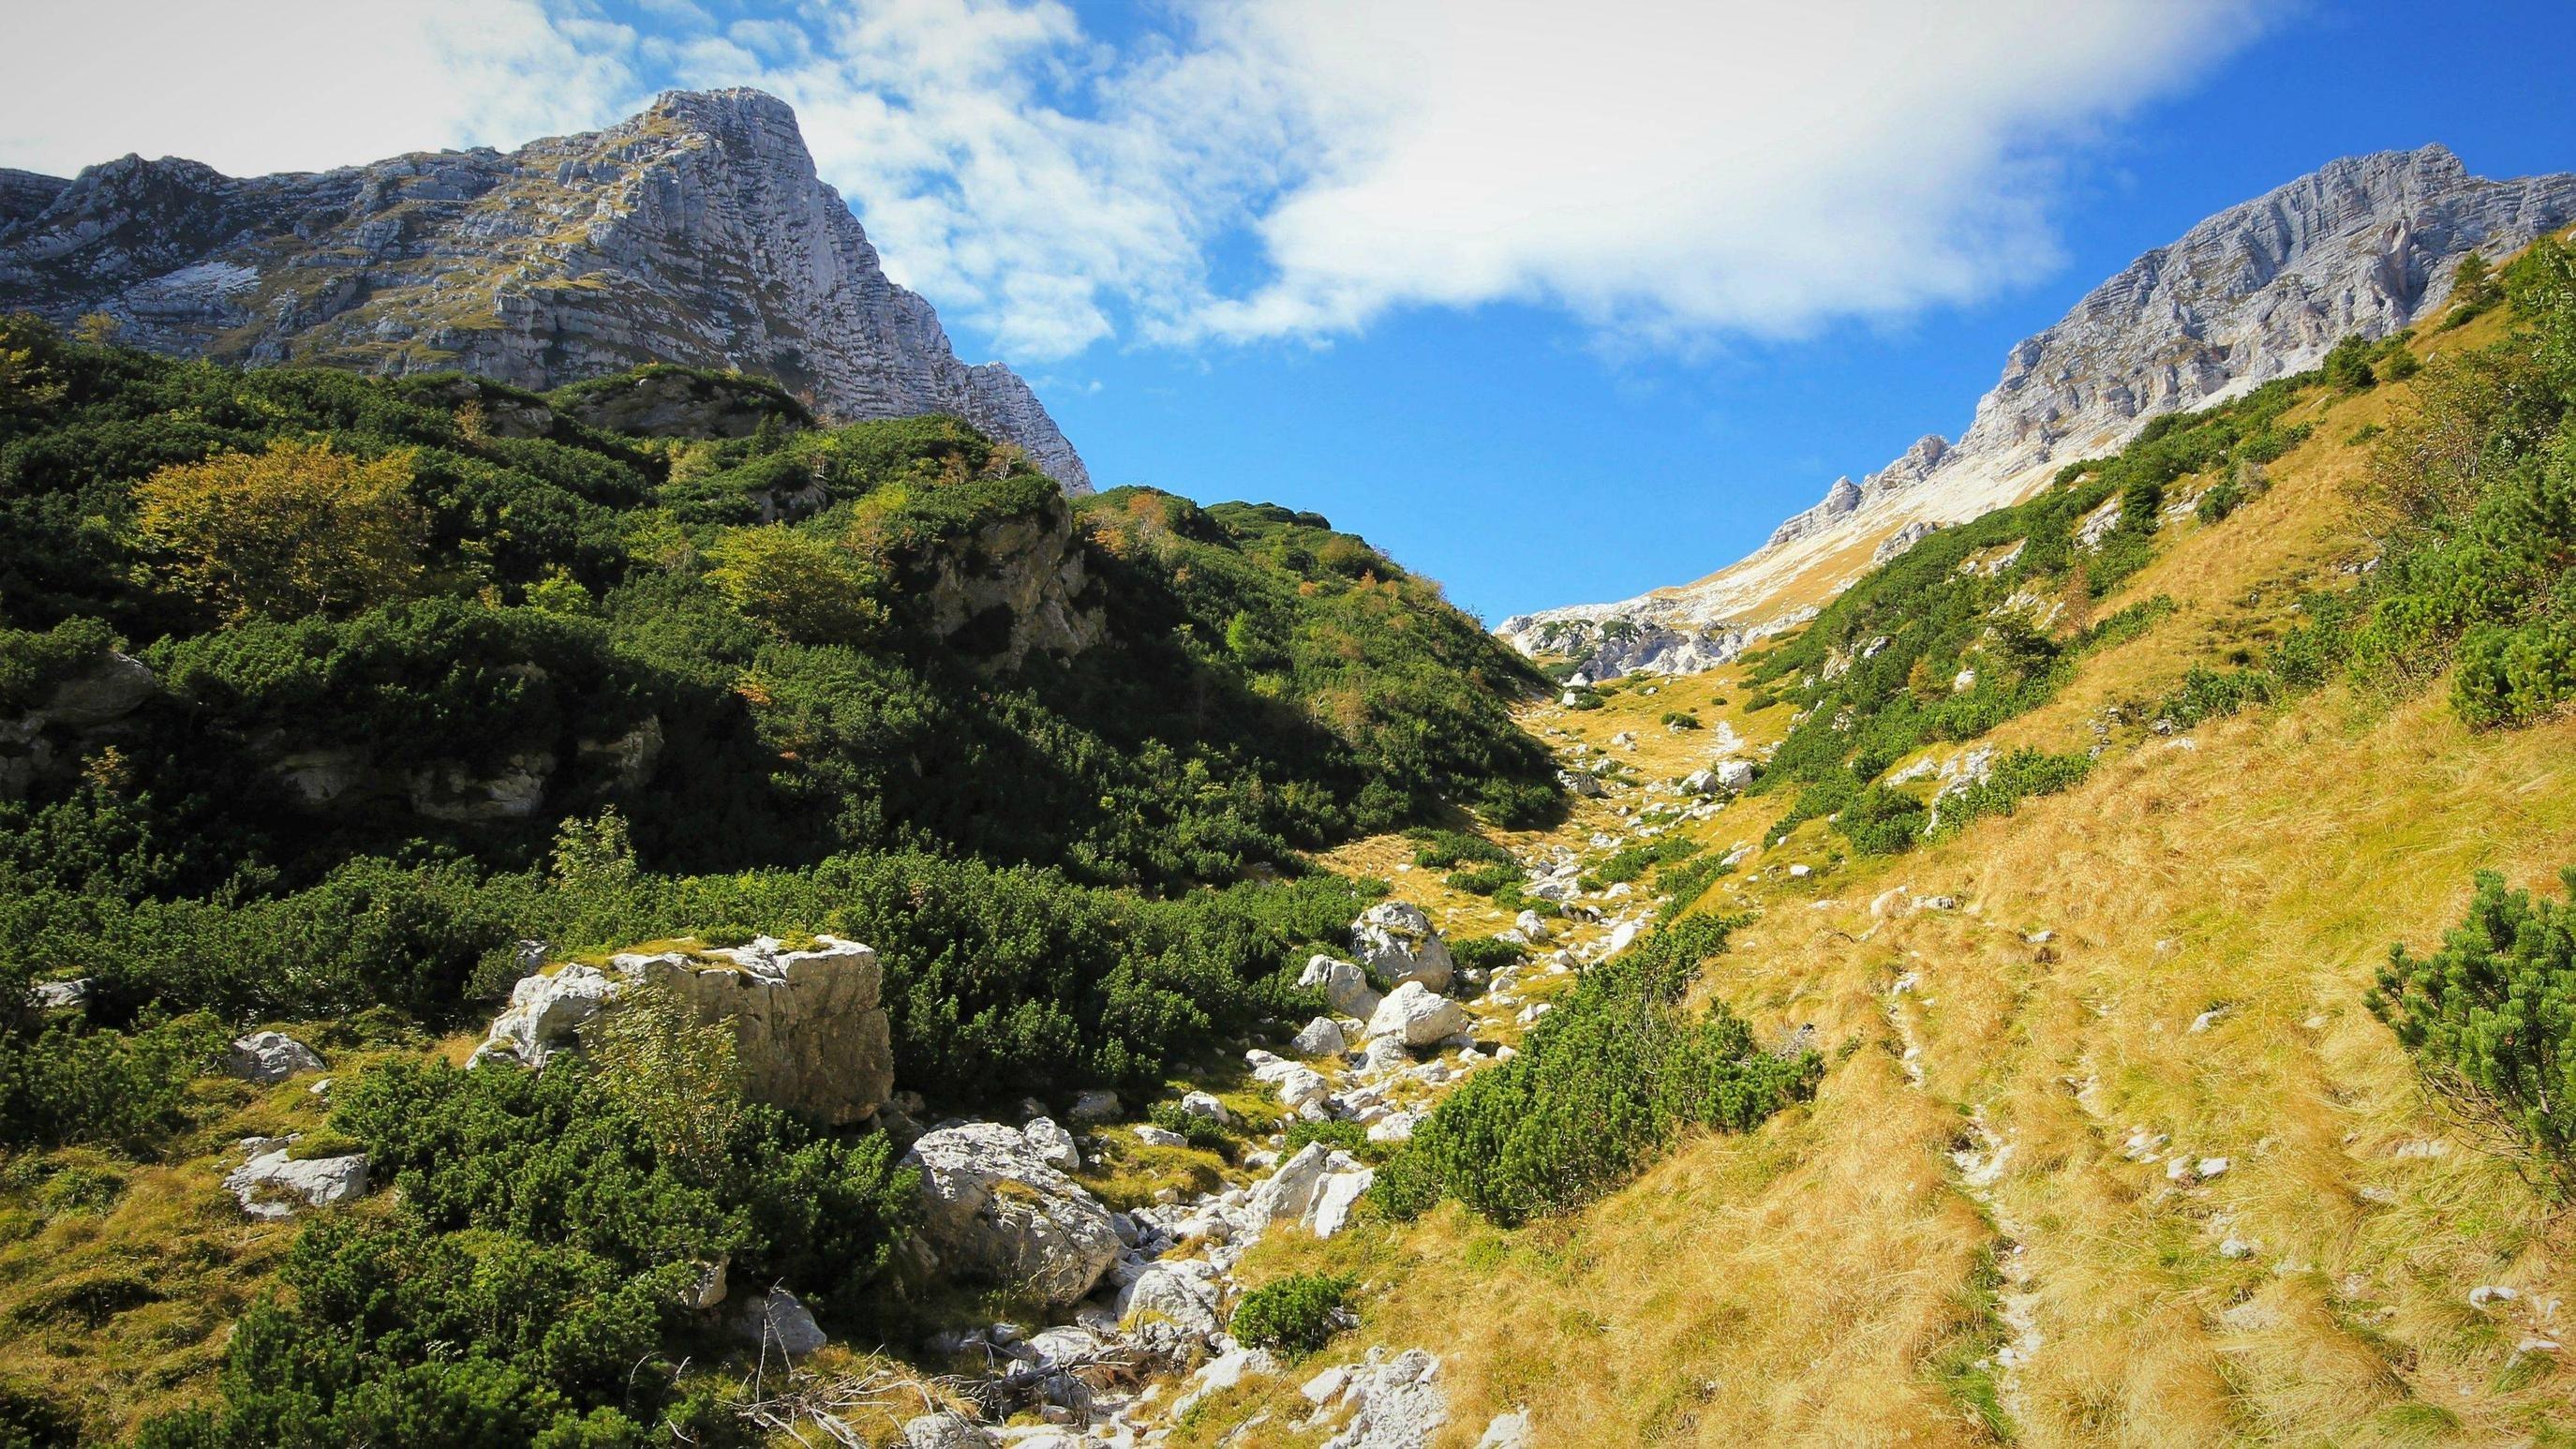 Fall Wallpaper Hd For Galaxy S4 Early Fall In The Julian Alps Kanin Area Hd Wallpaper